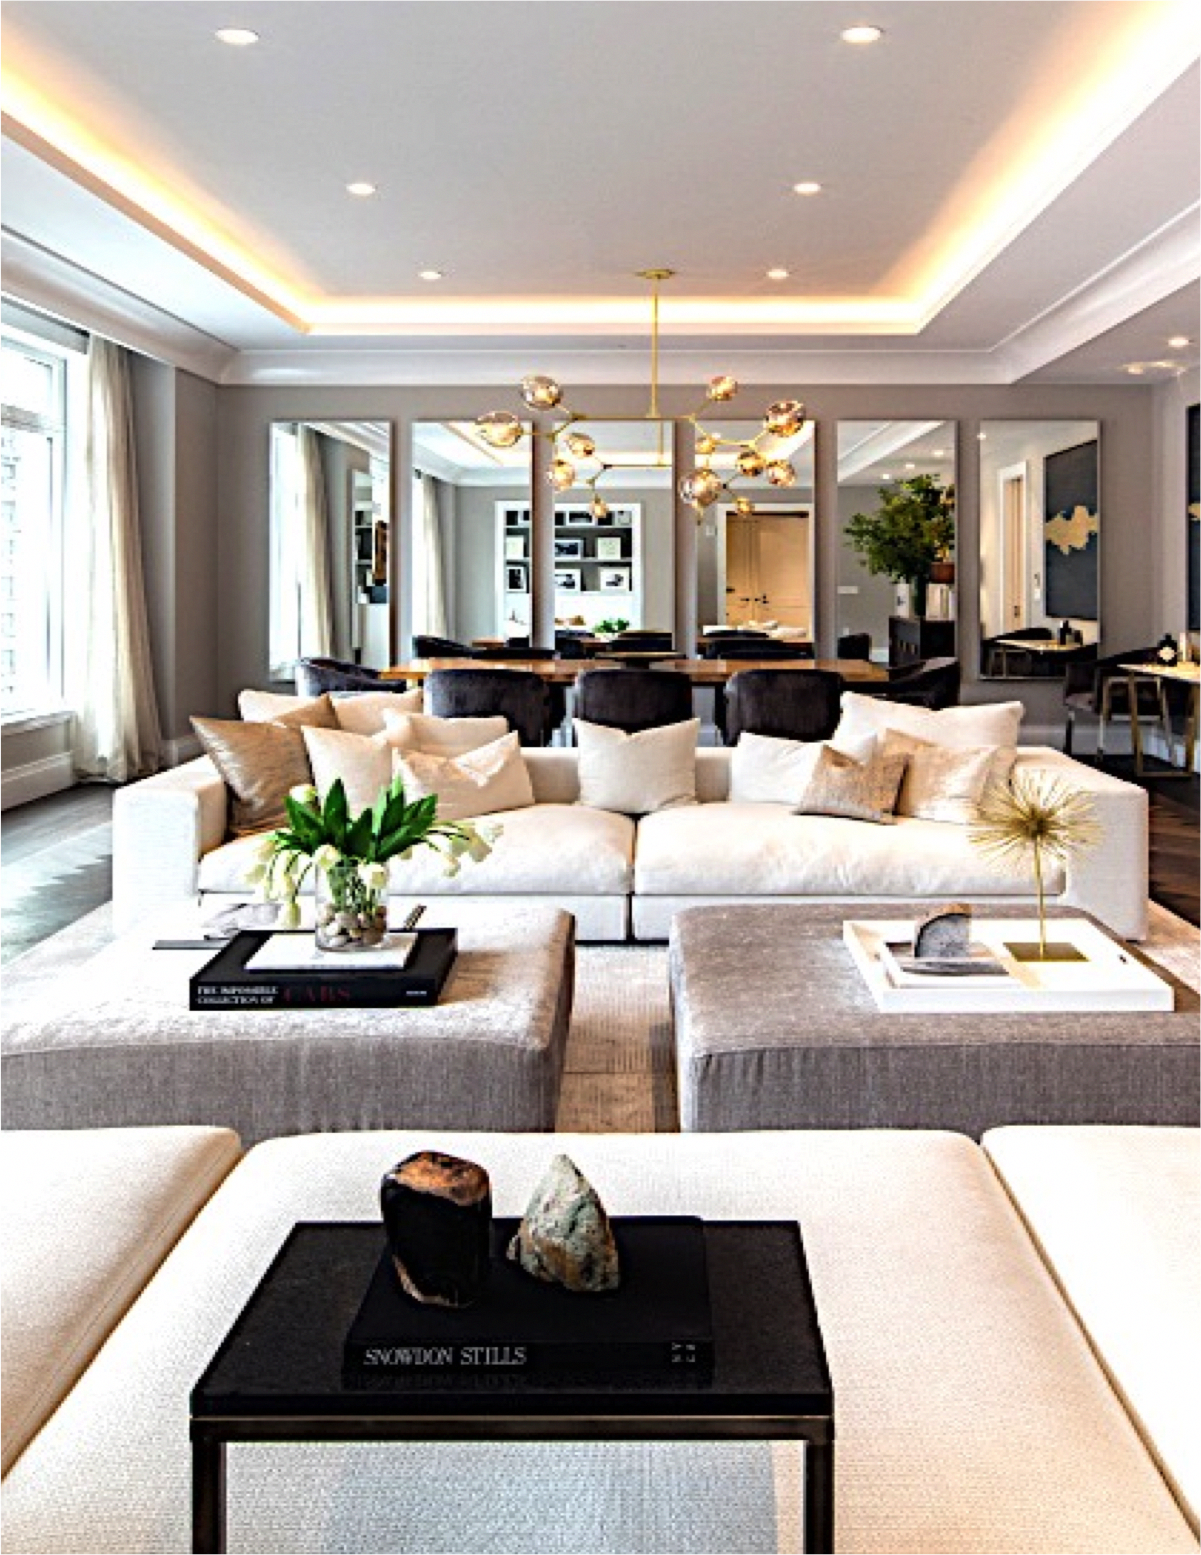 USA contemporary home decor and mid-century modern lighting ...